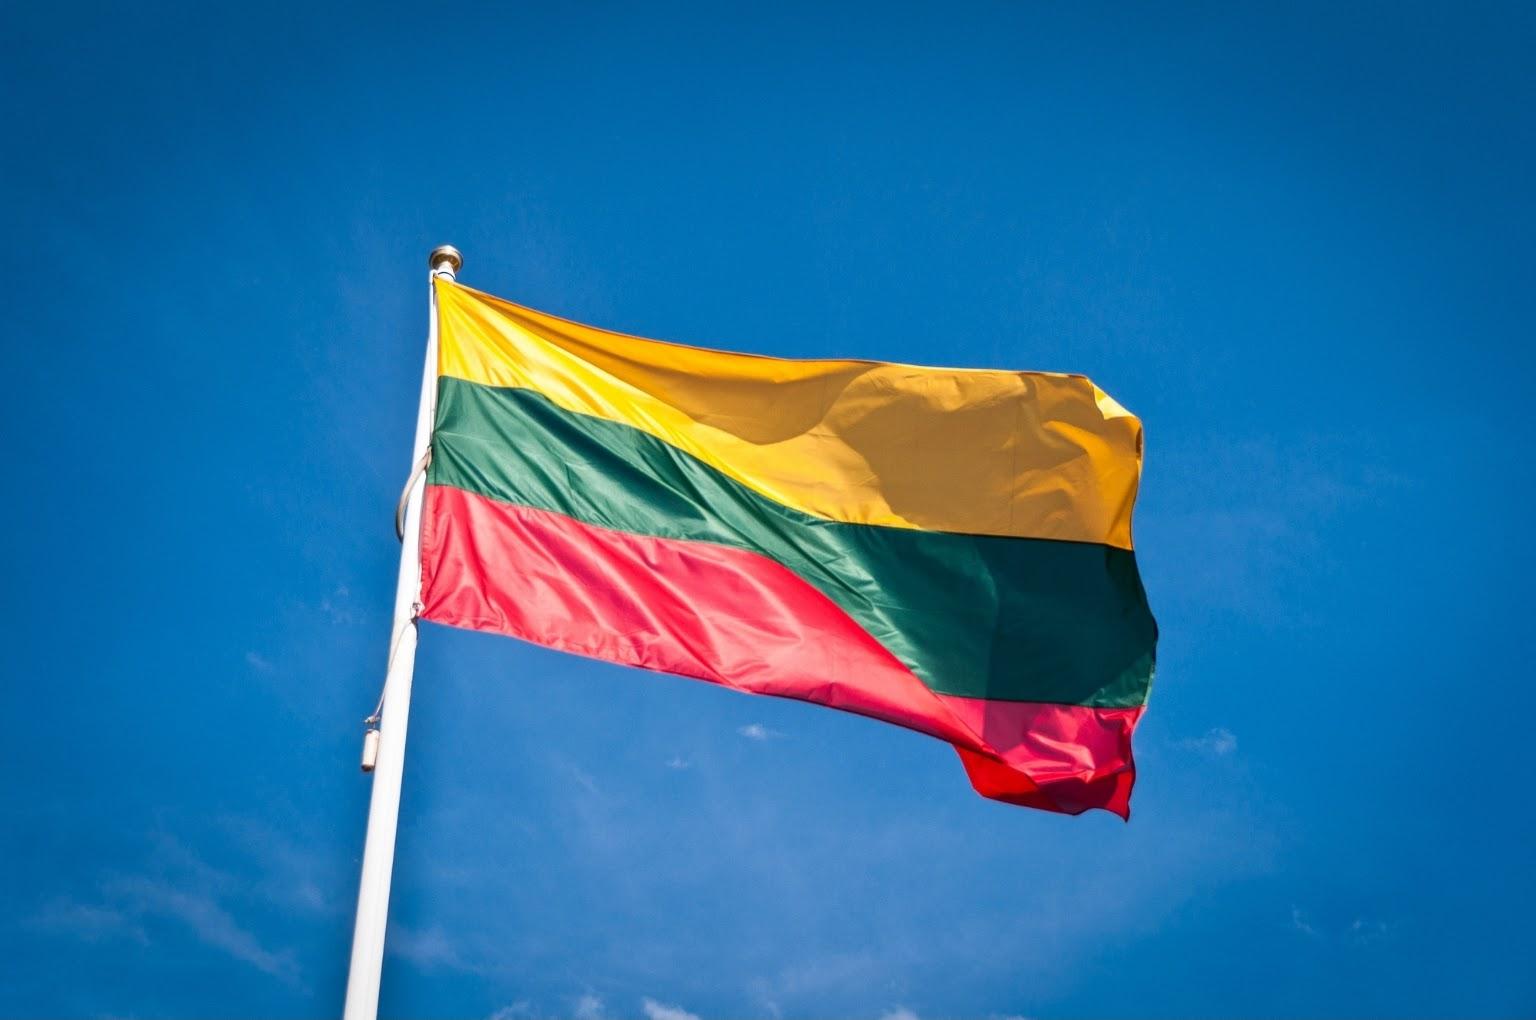 Lithuania celebrates 2 independence days